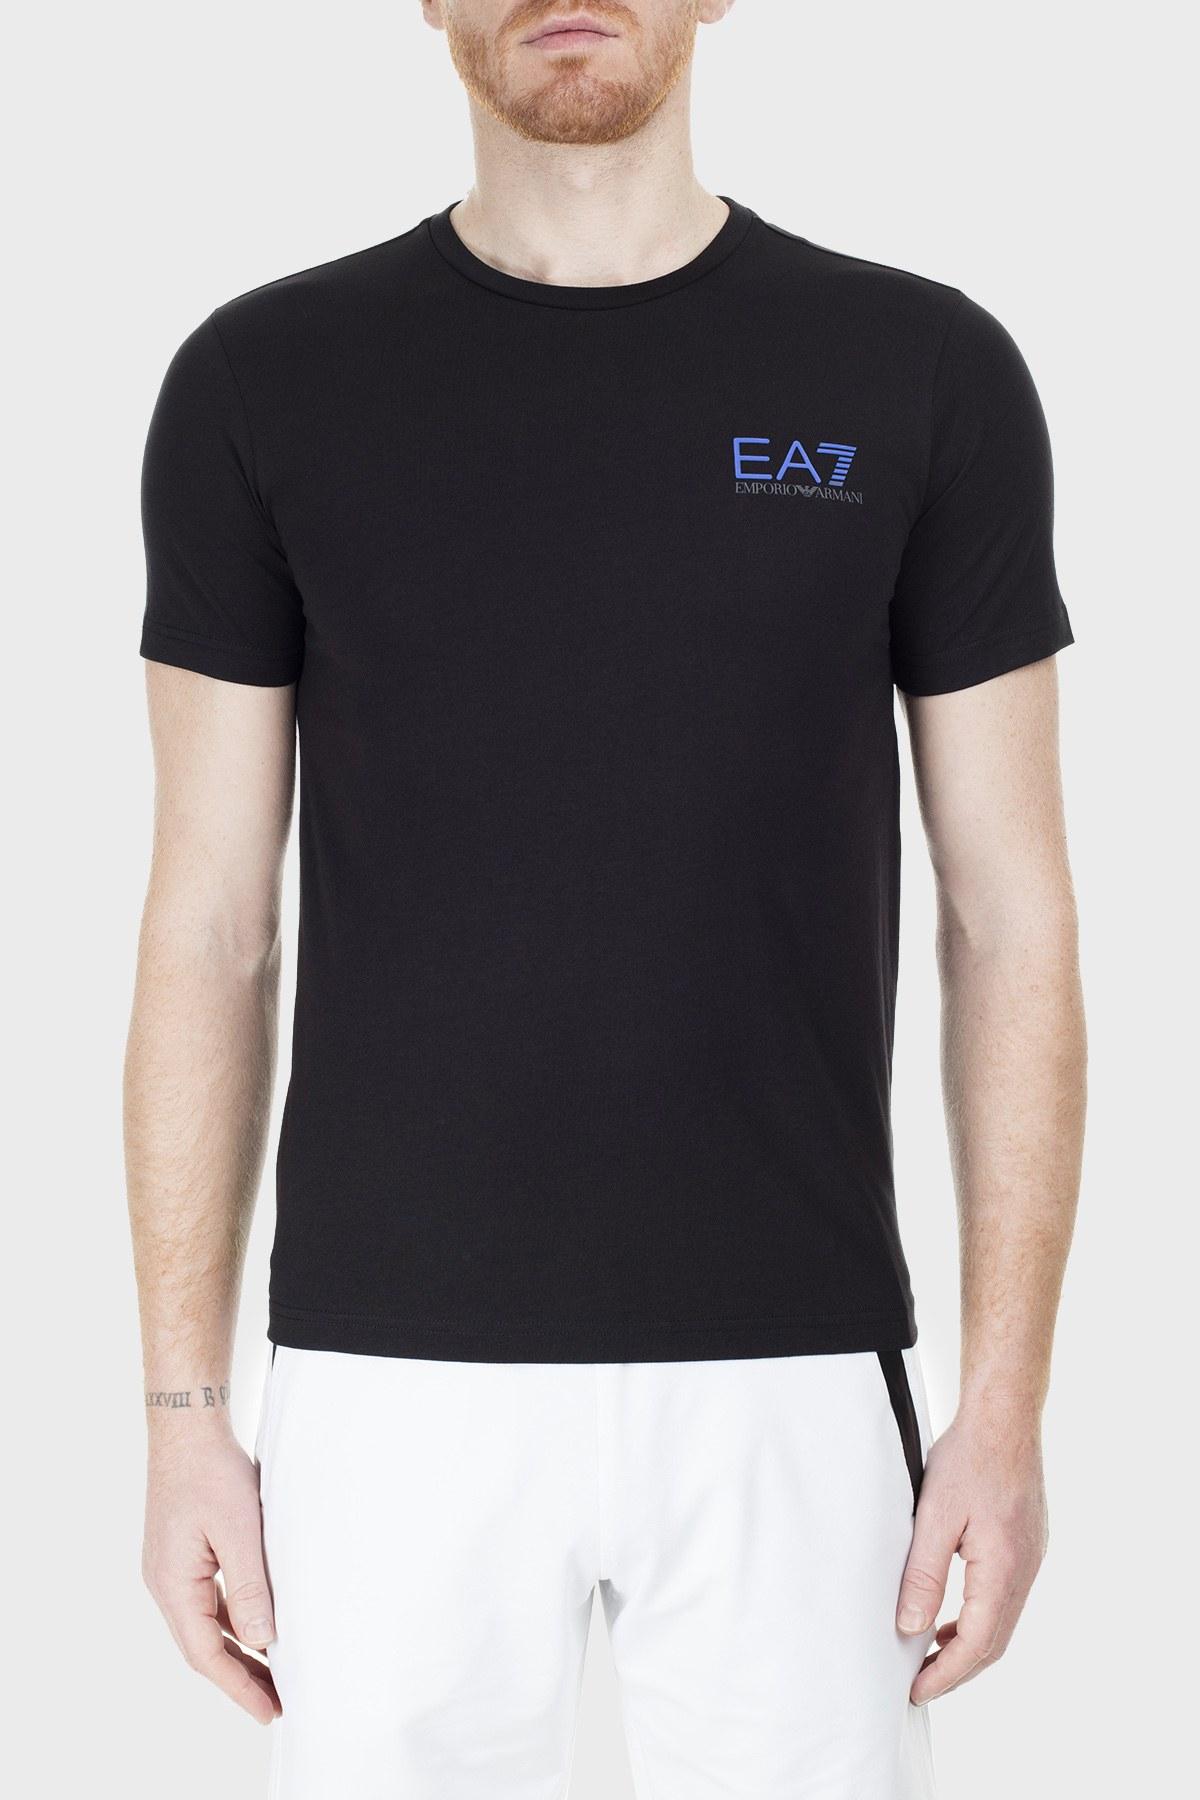 EA7 Regular Fit Erkek T Shirt S 6GPT15 PJ02Z 1200 SİYAH